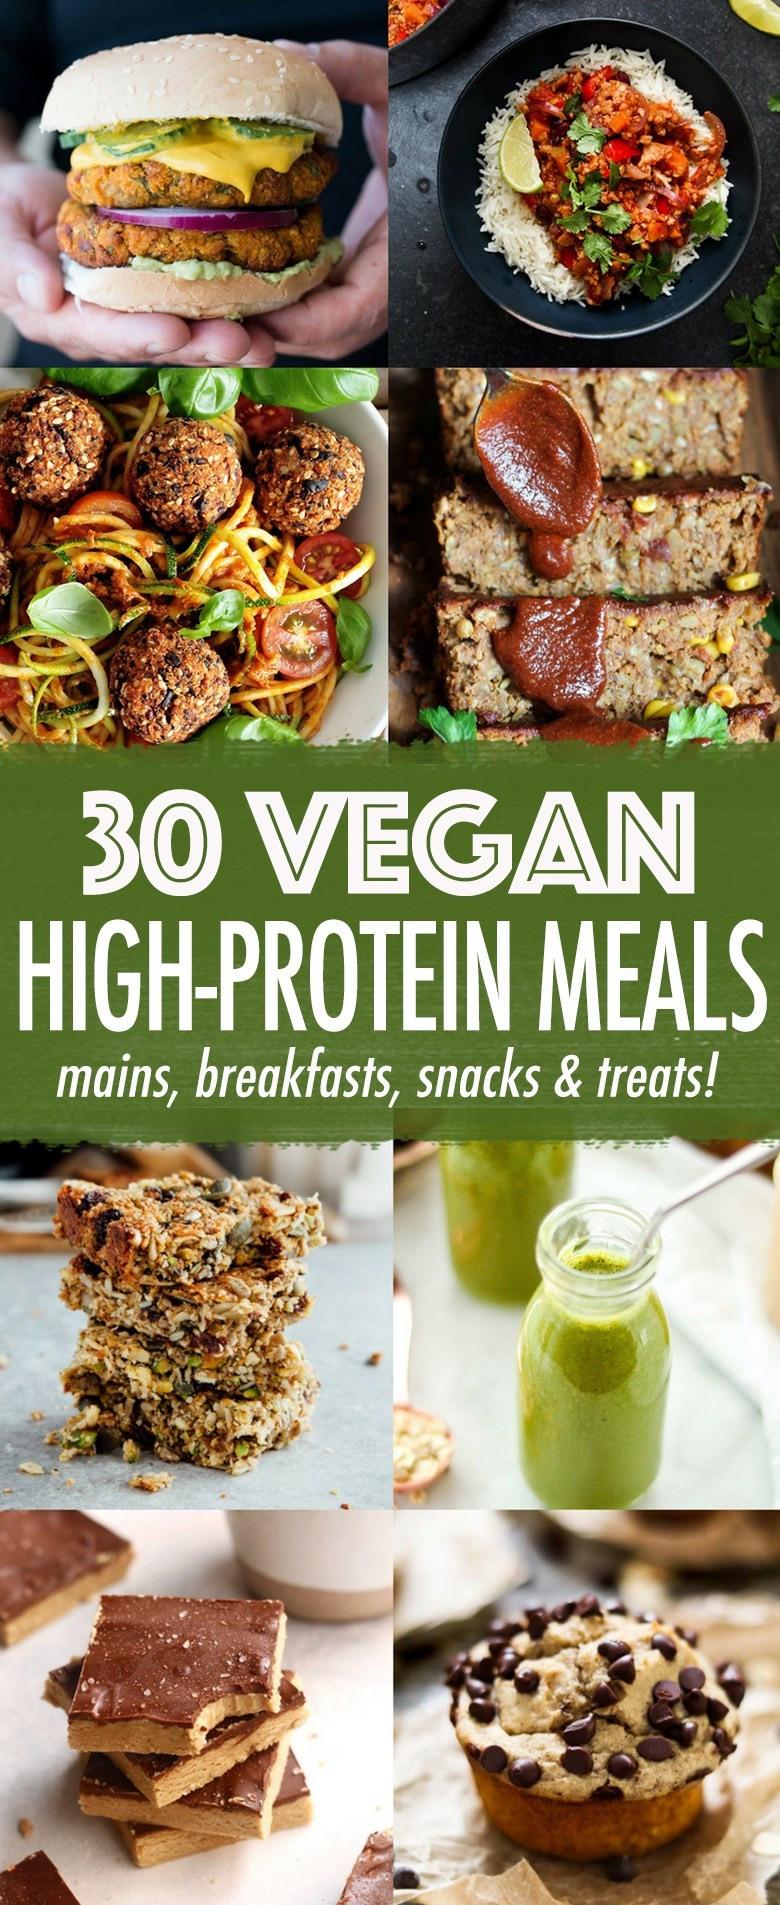 Healthy Vegetarian Meals With Protein  30 High protein Vegan Meals Wallflower Kitchen